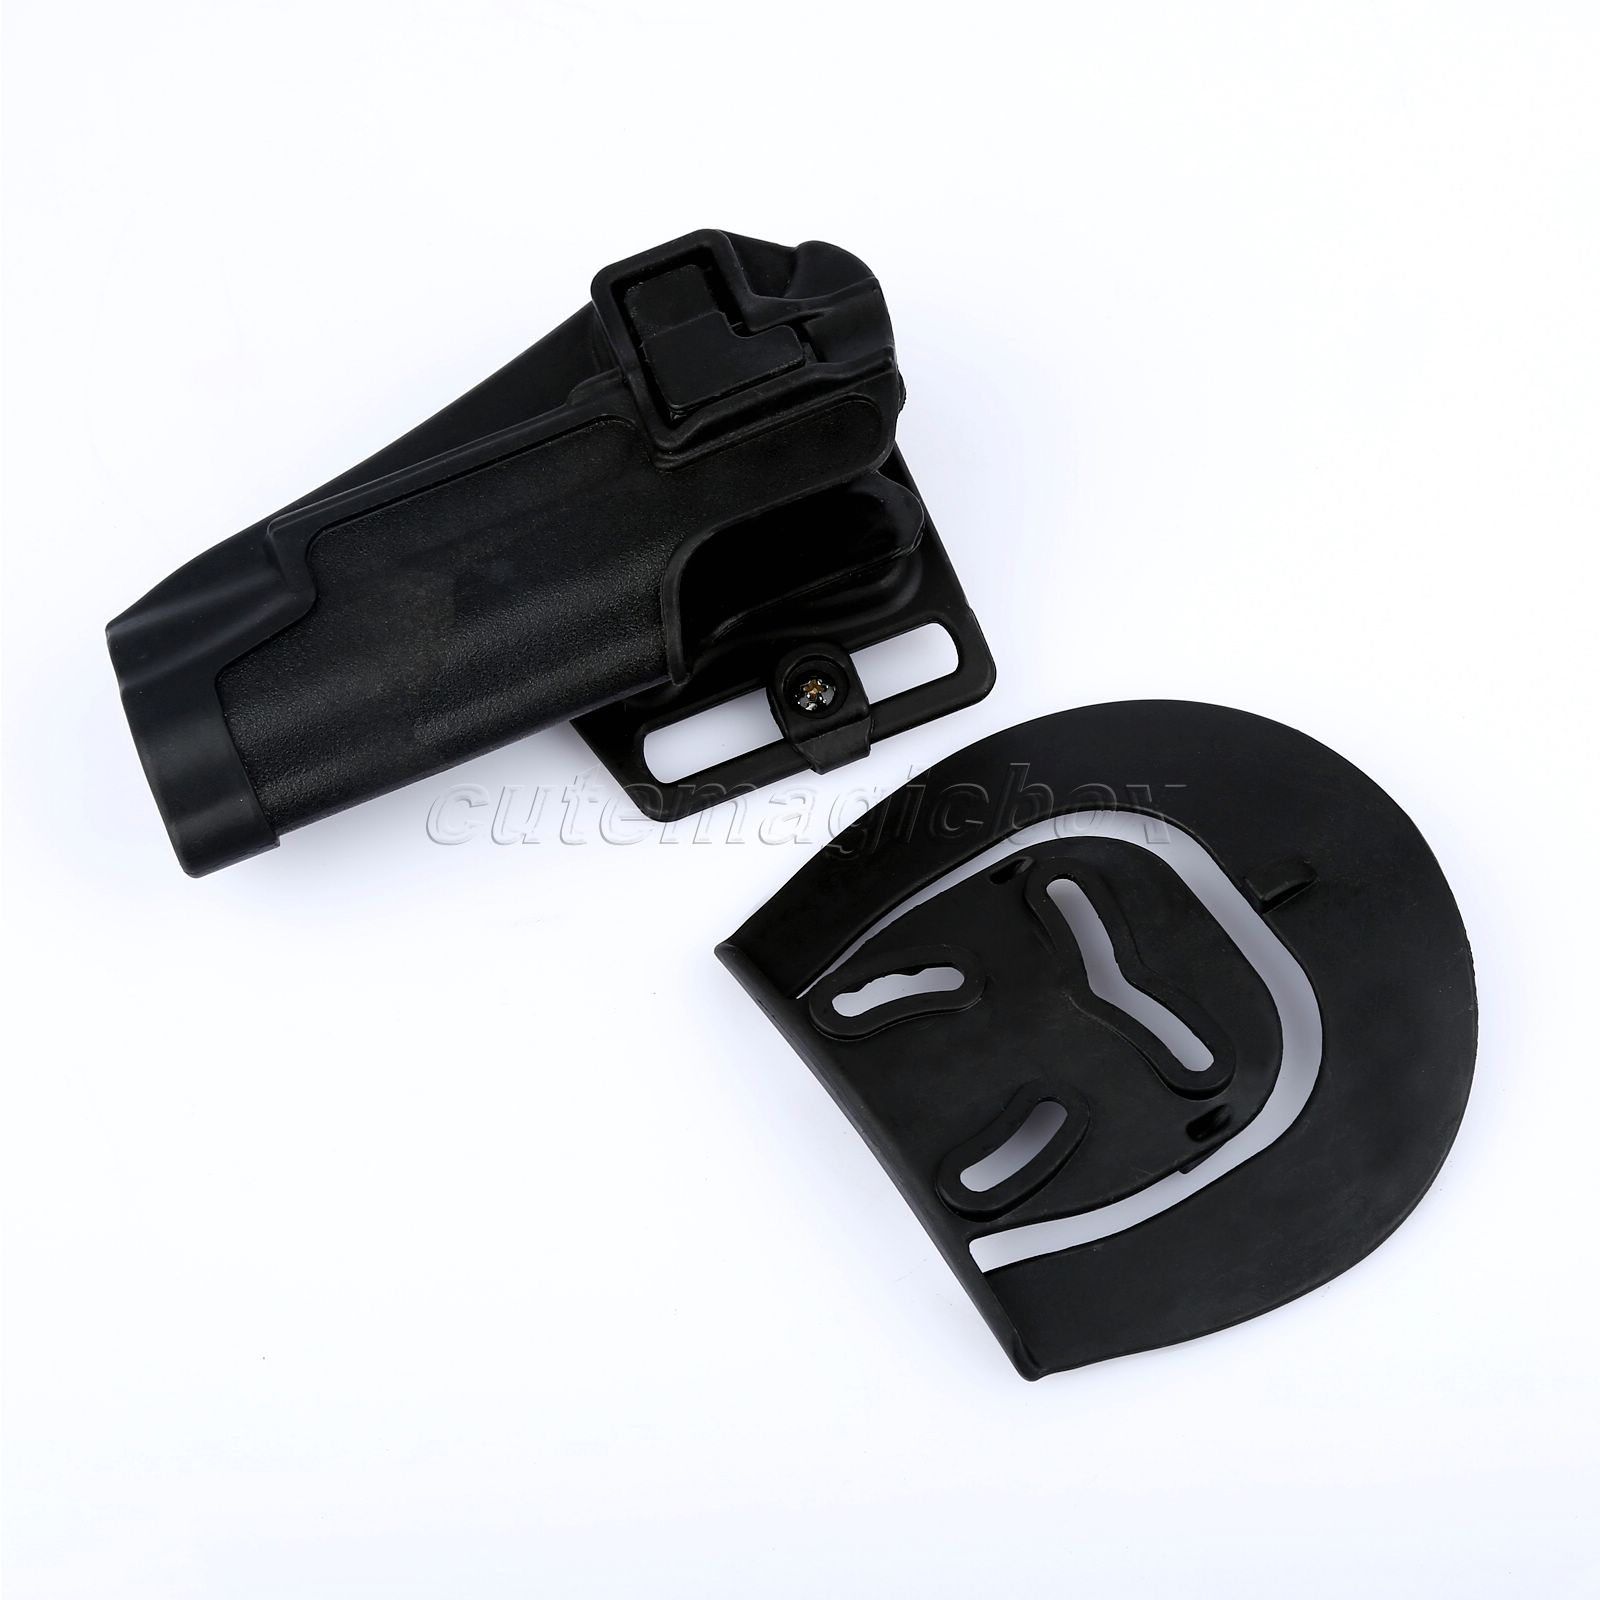 ④Polímero negro dibujo rápido Tactical airsoft mano derecha con ...